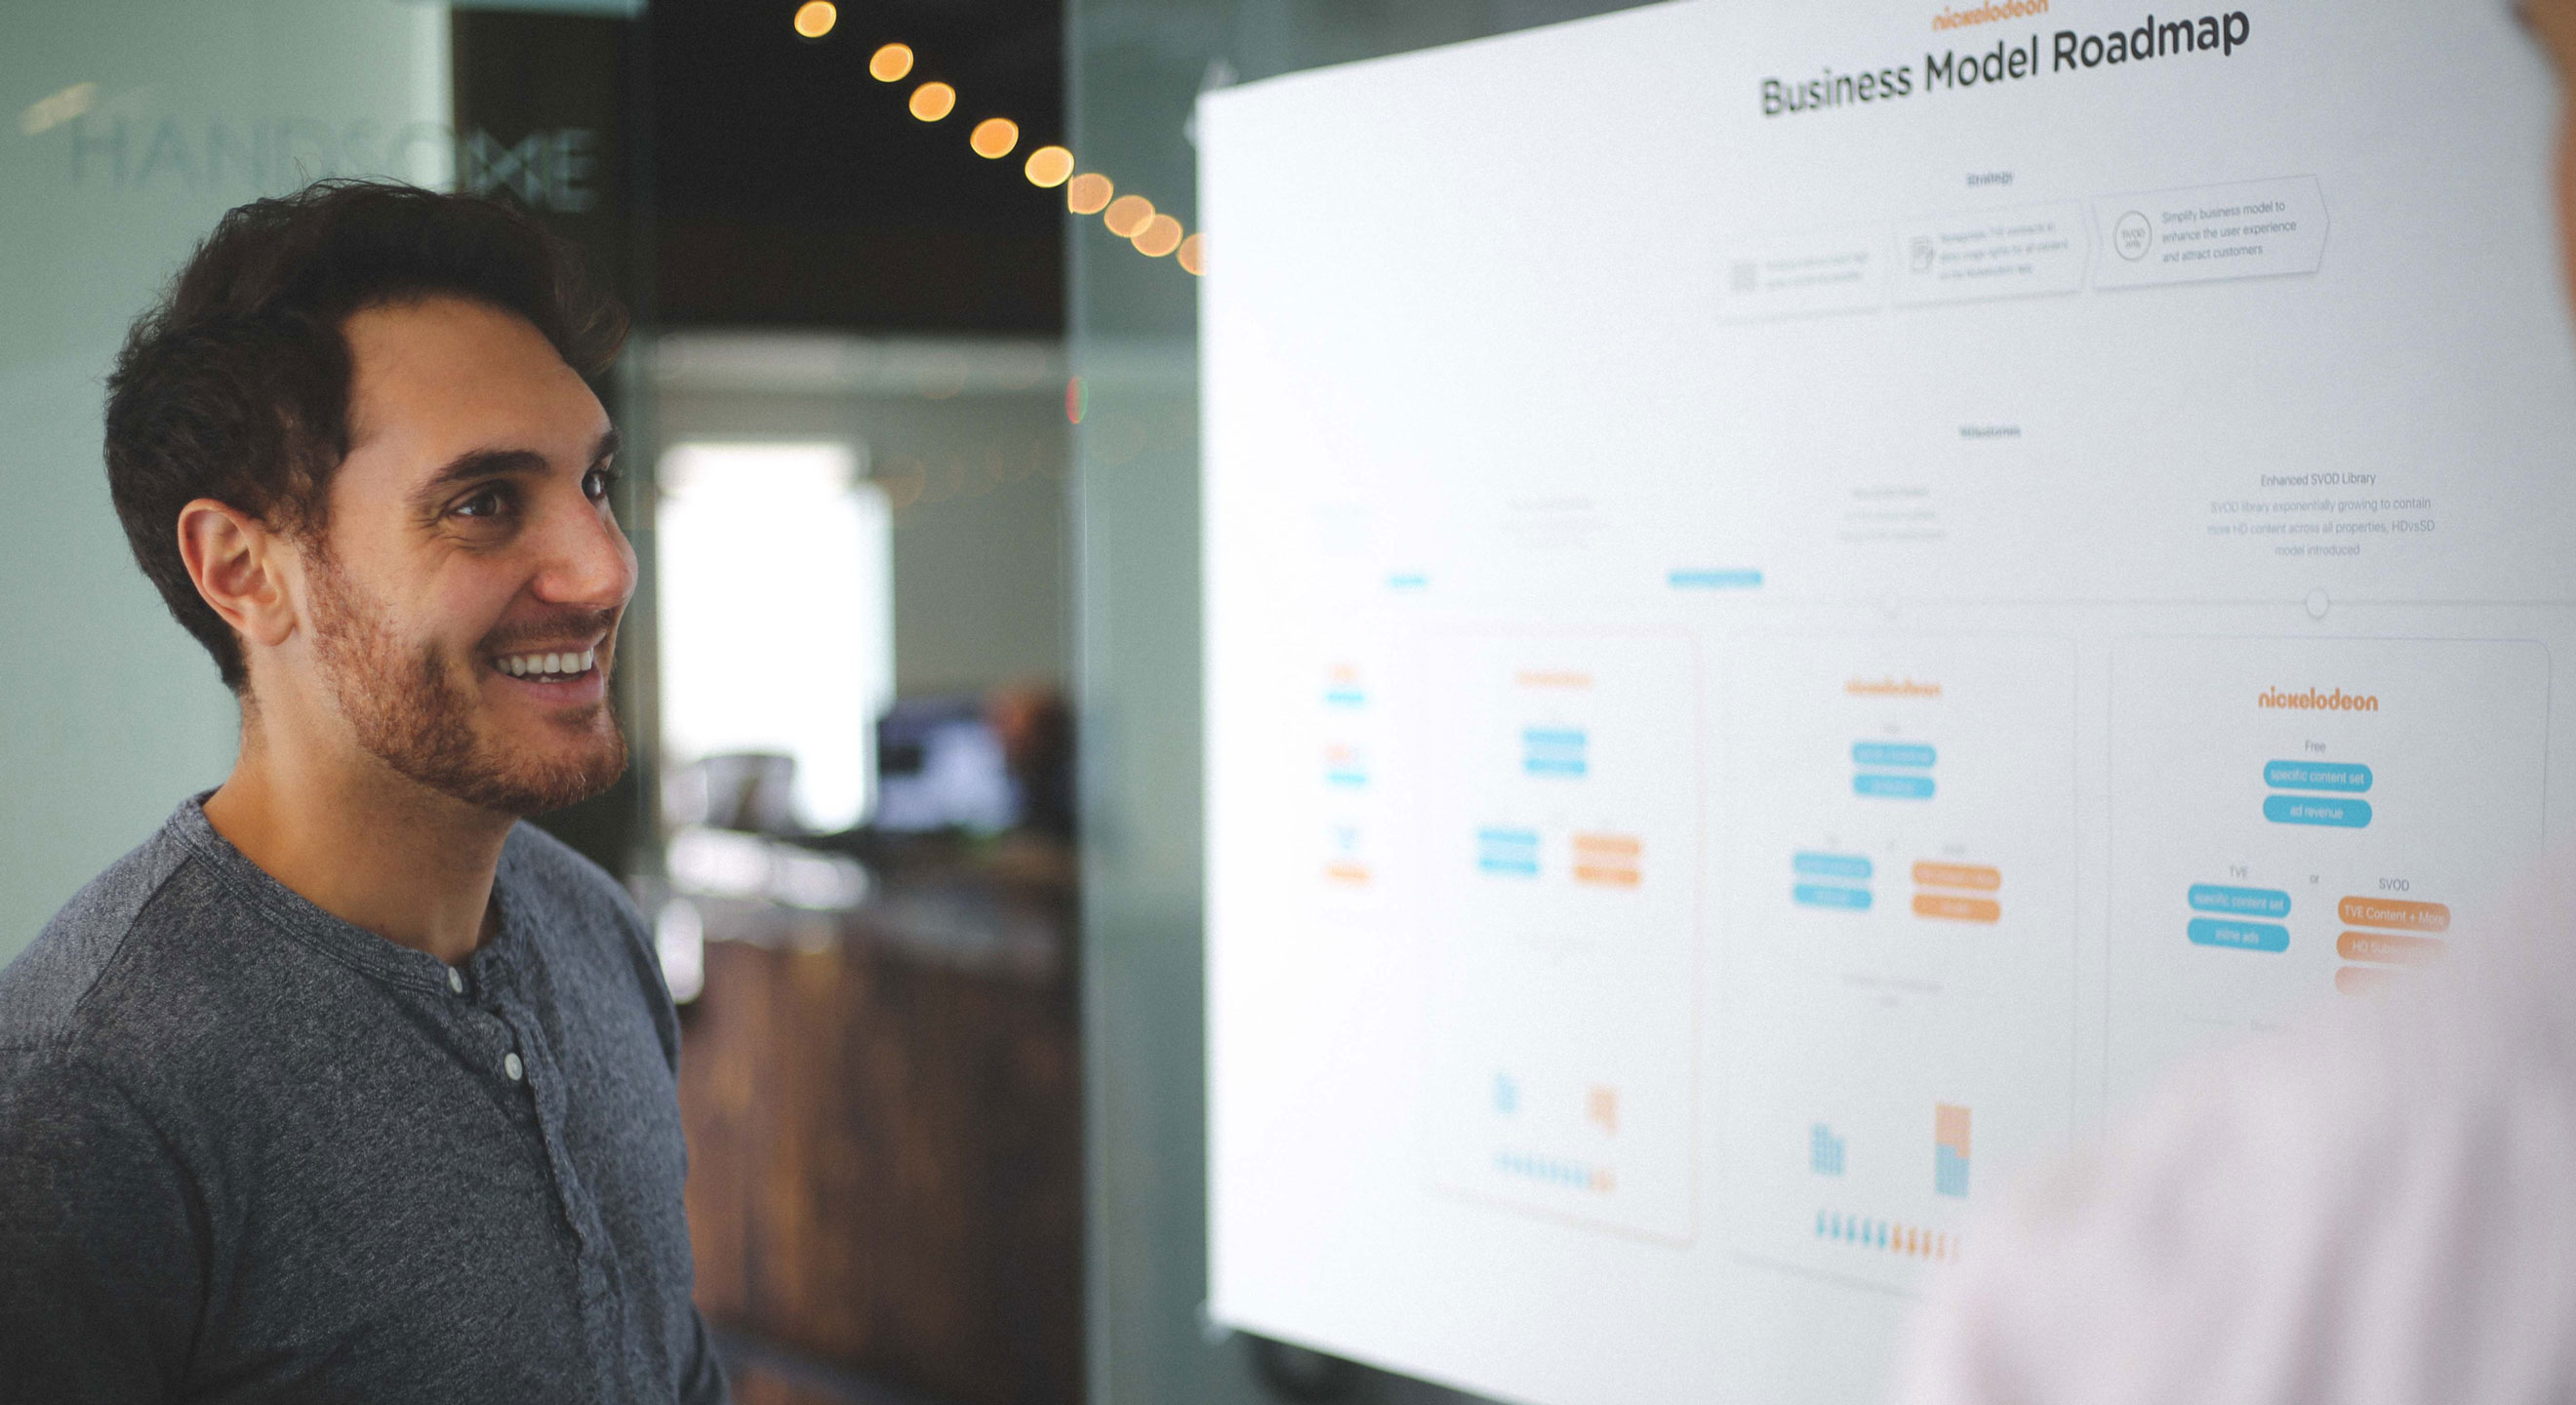 Nickelodeon Business Model Roadmap